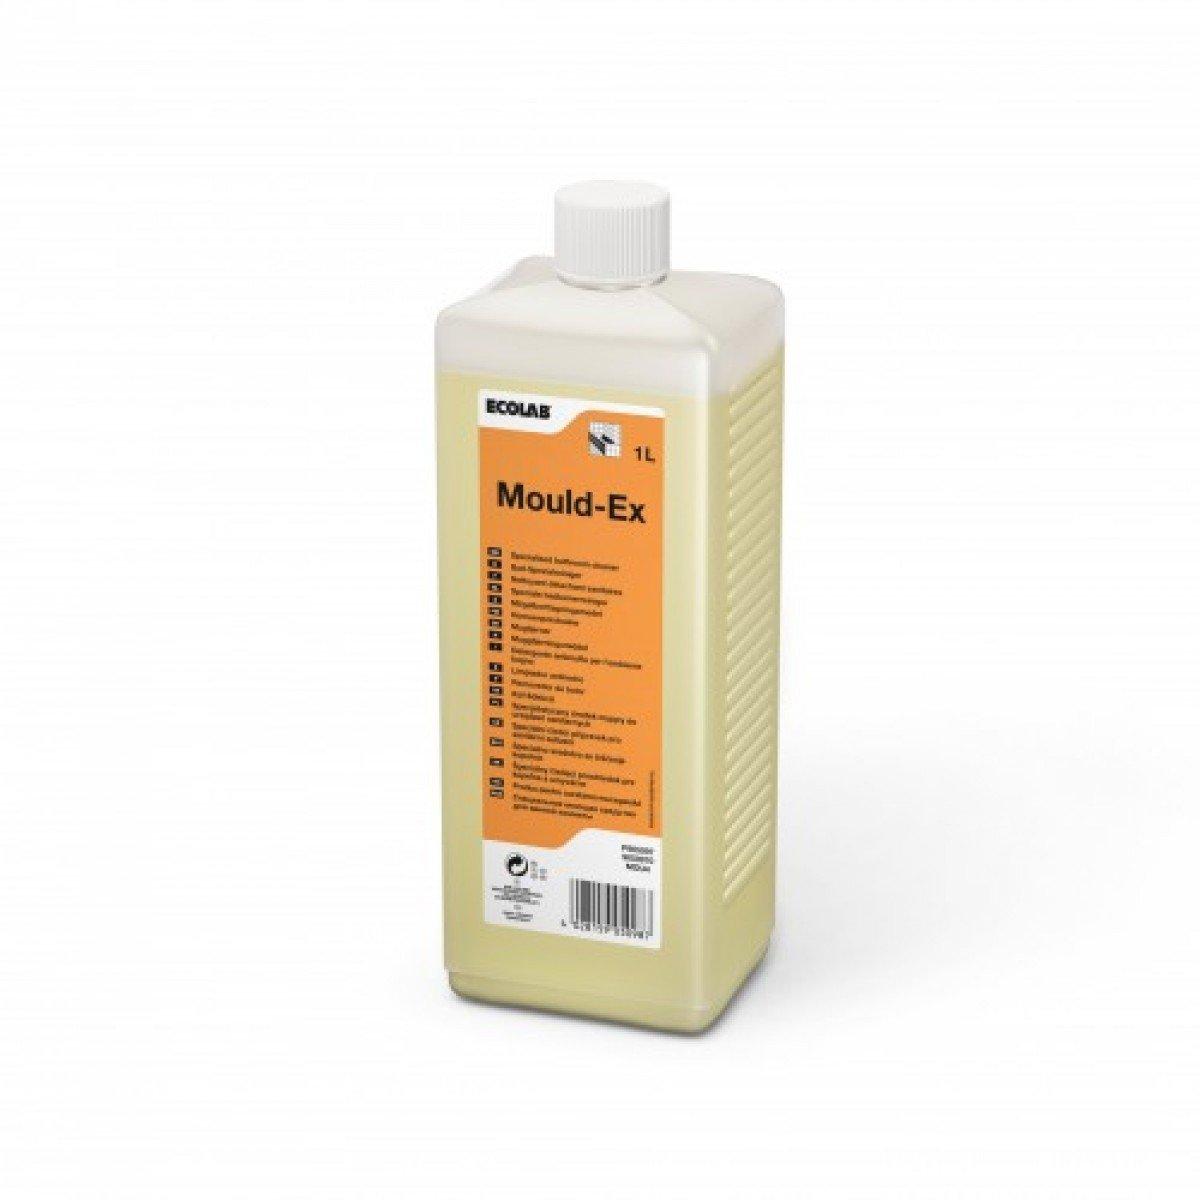 Ecolab | Mould-ex | Schimmelverwijderaar | Fles 4 x 1 liter